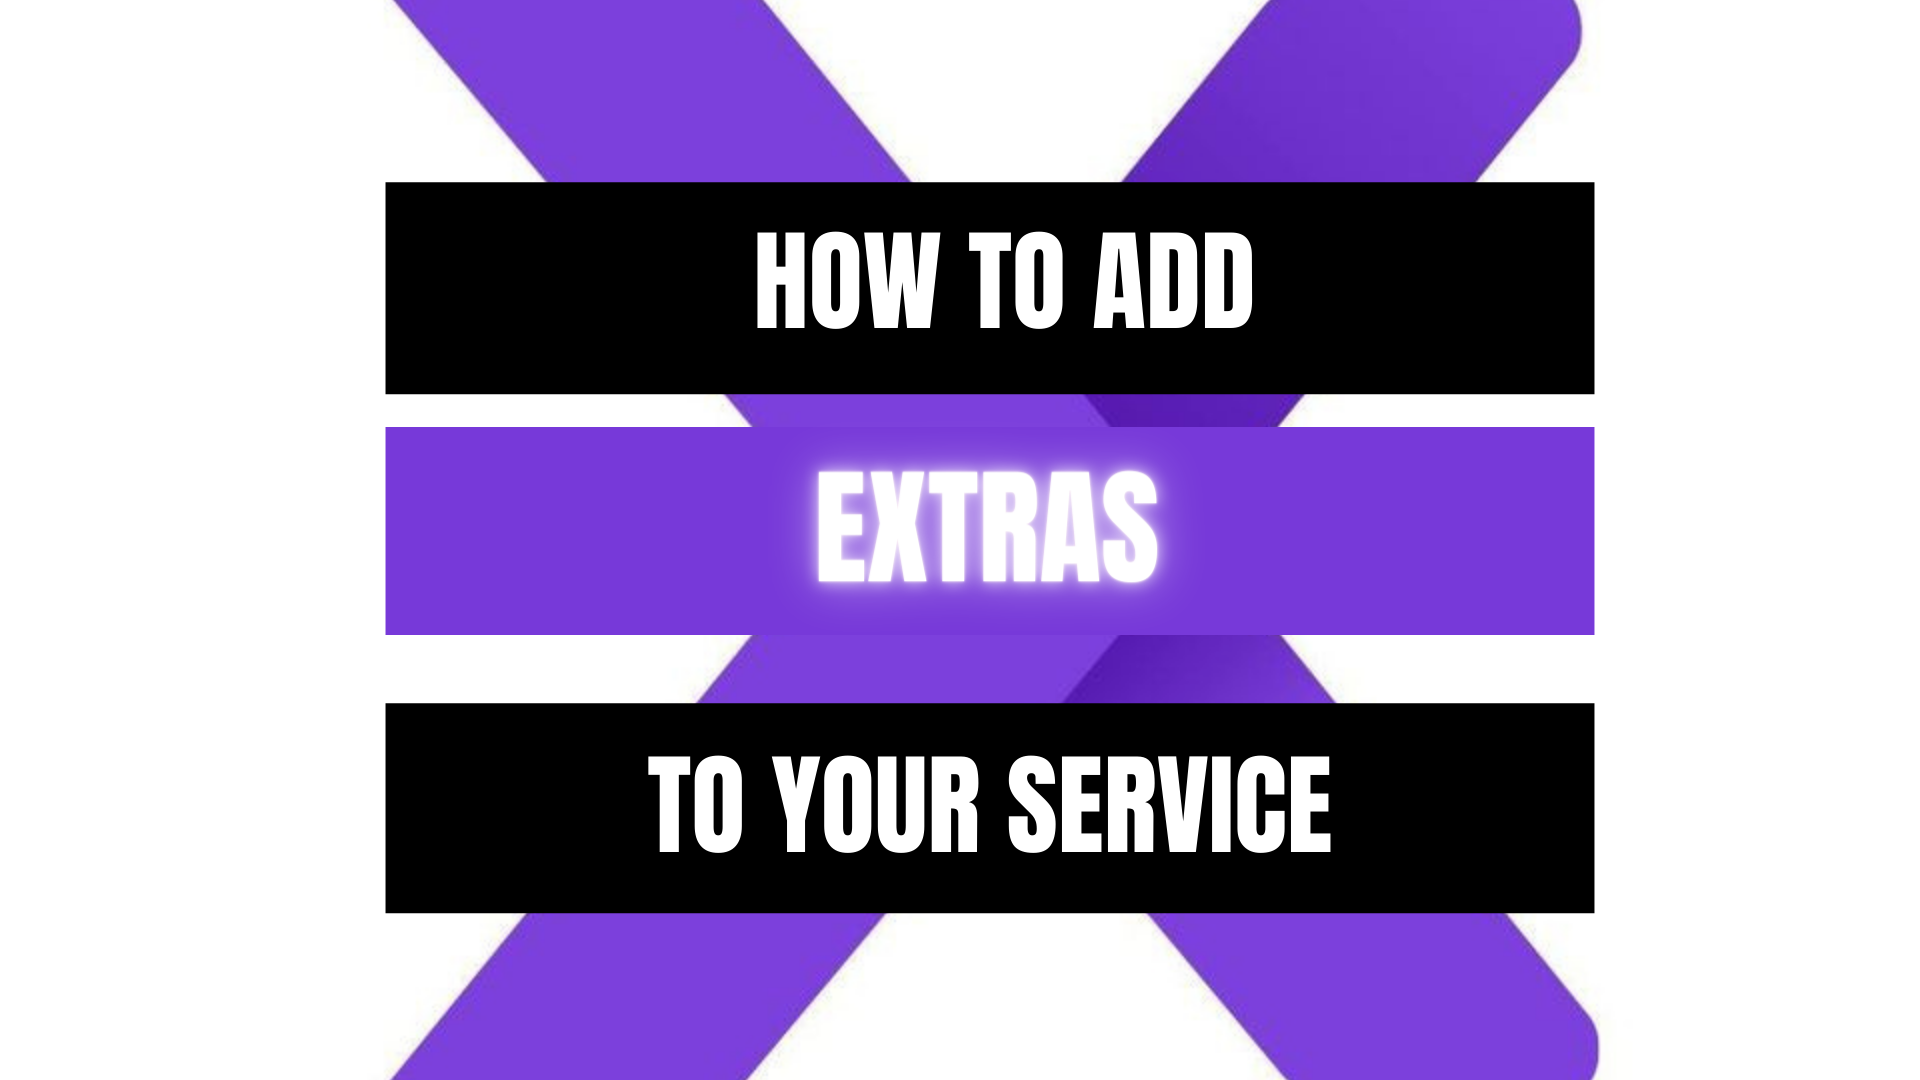 Peekaboox - Add Service Extras